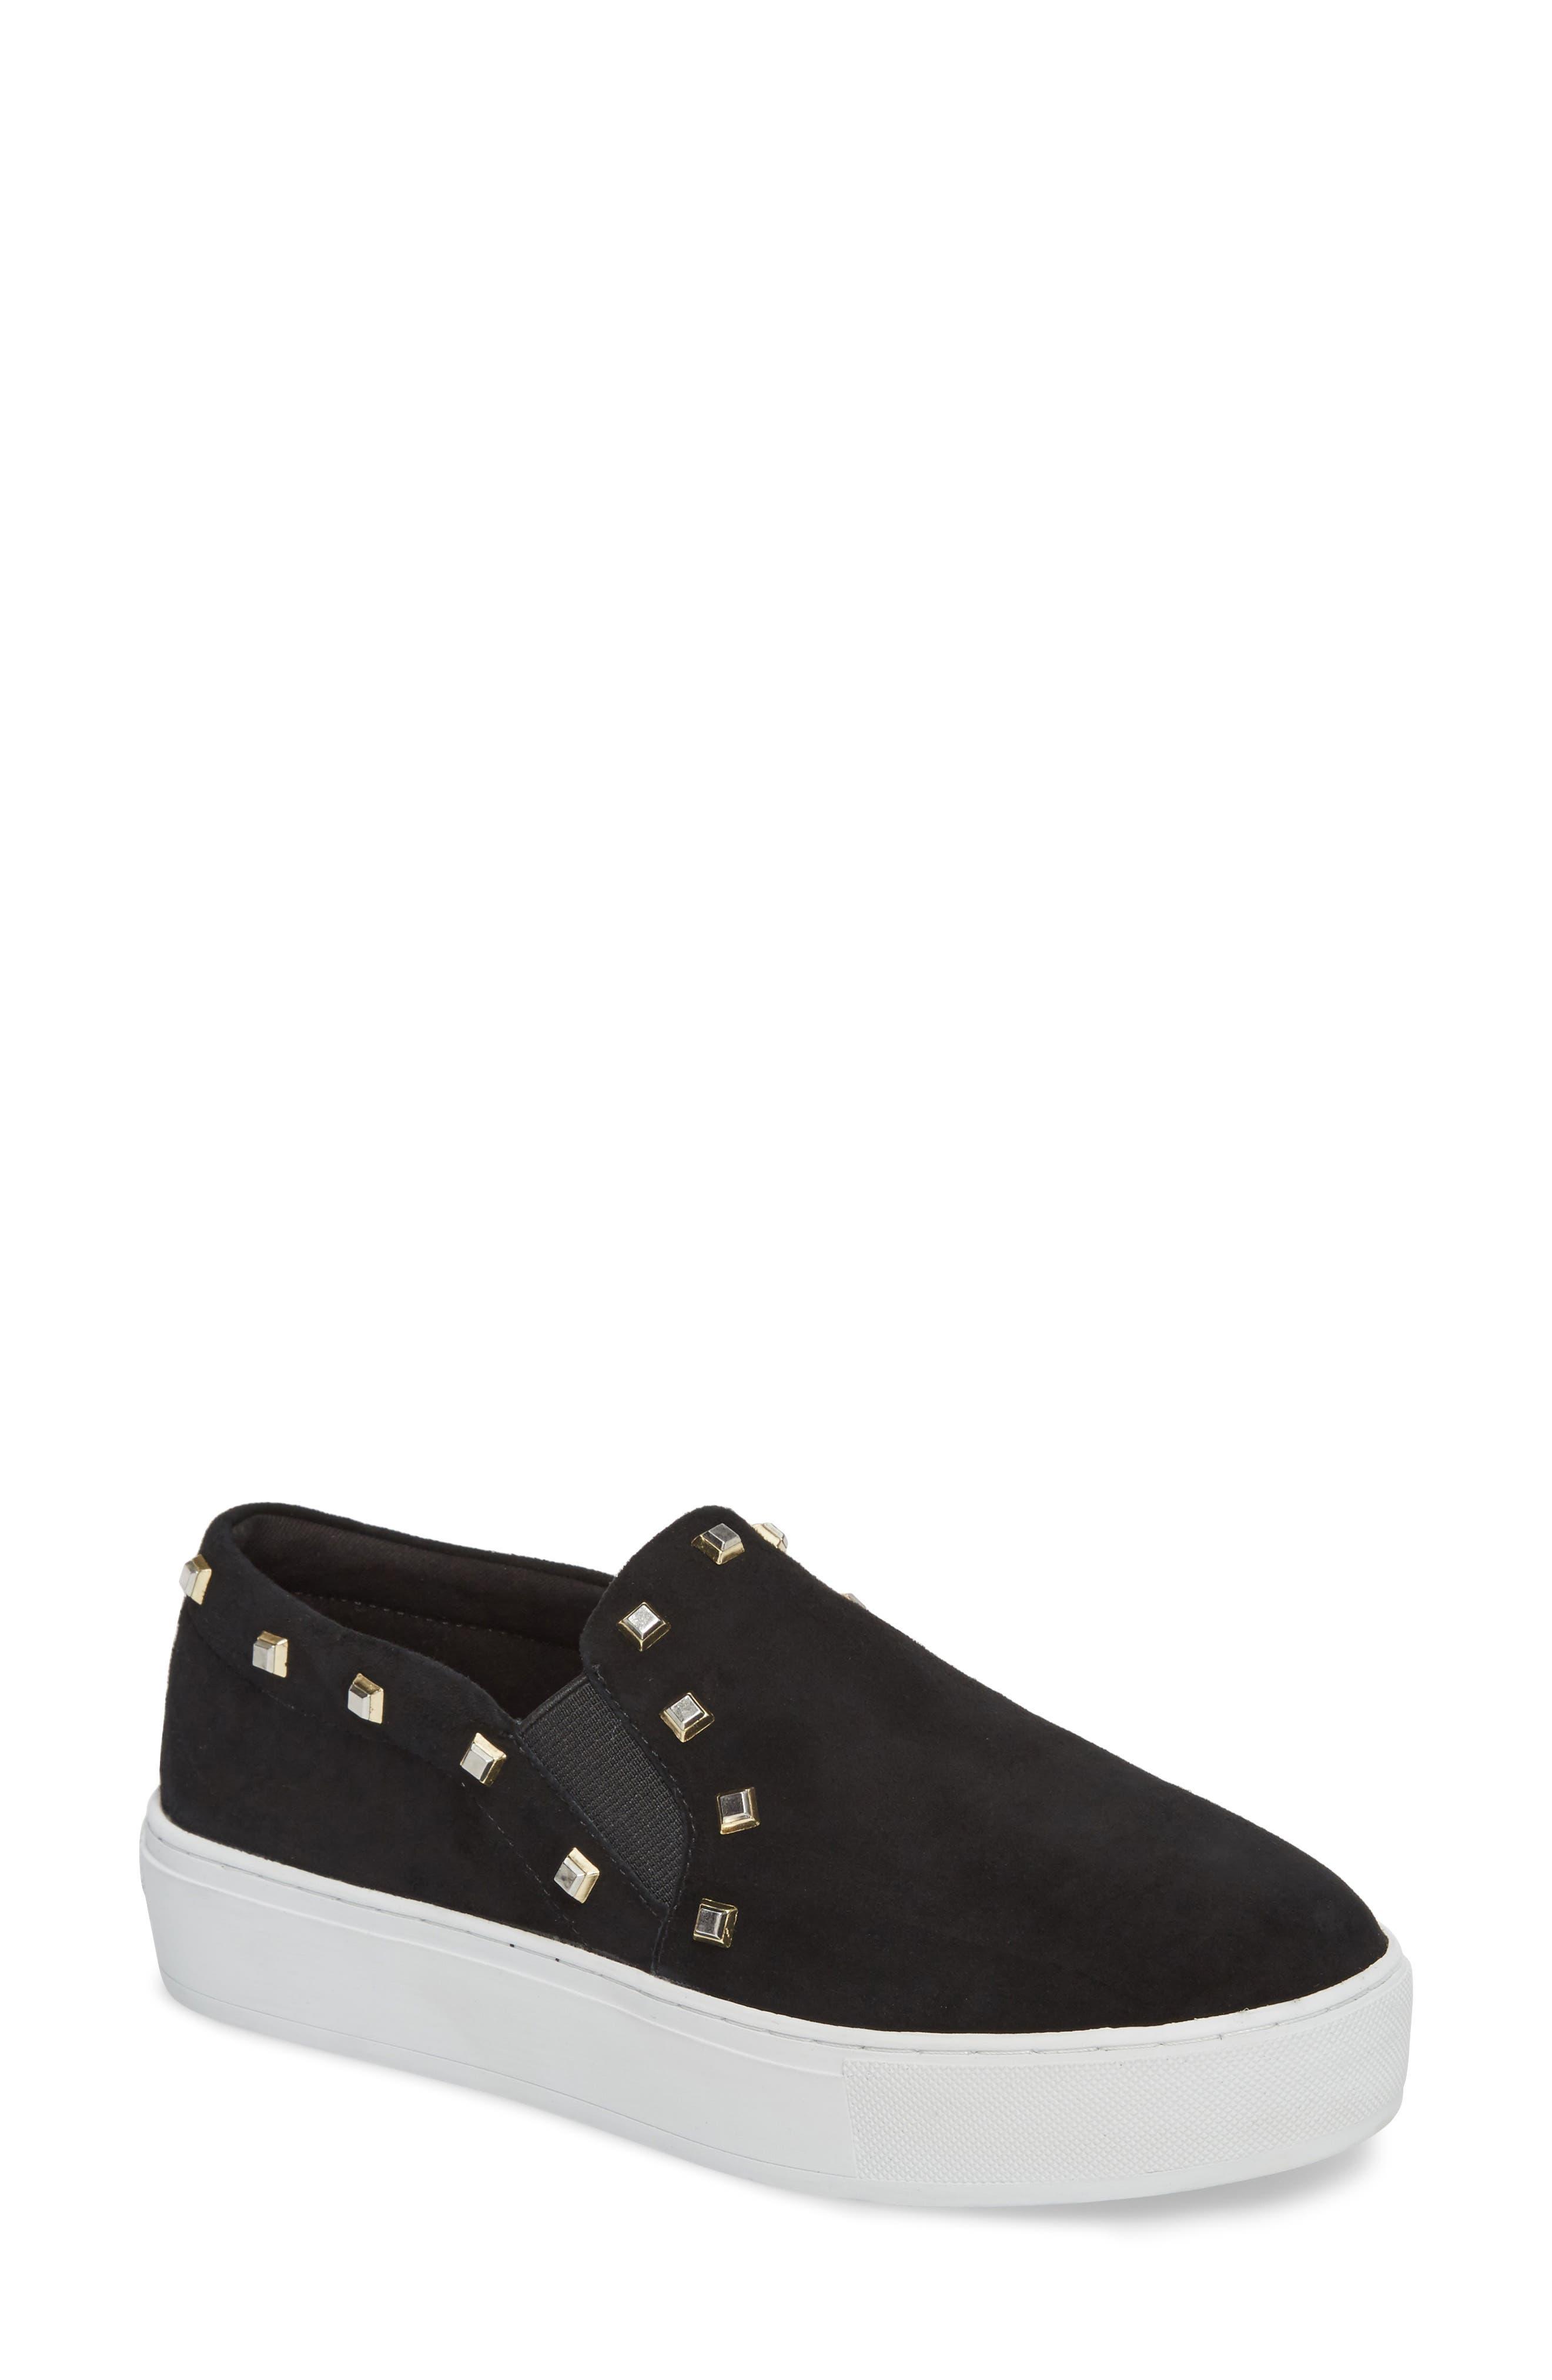 Nora Stud Platform Sneaker,                         Main,                         color, Black Suede